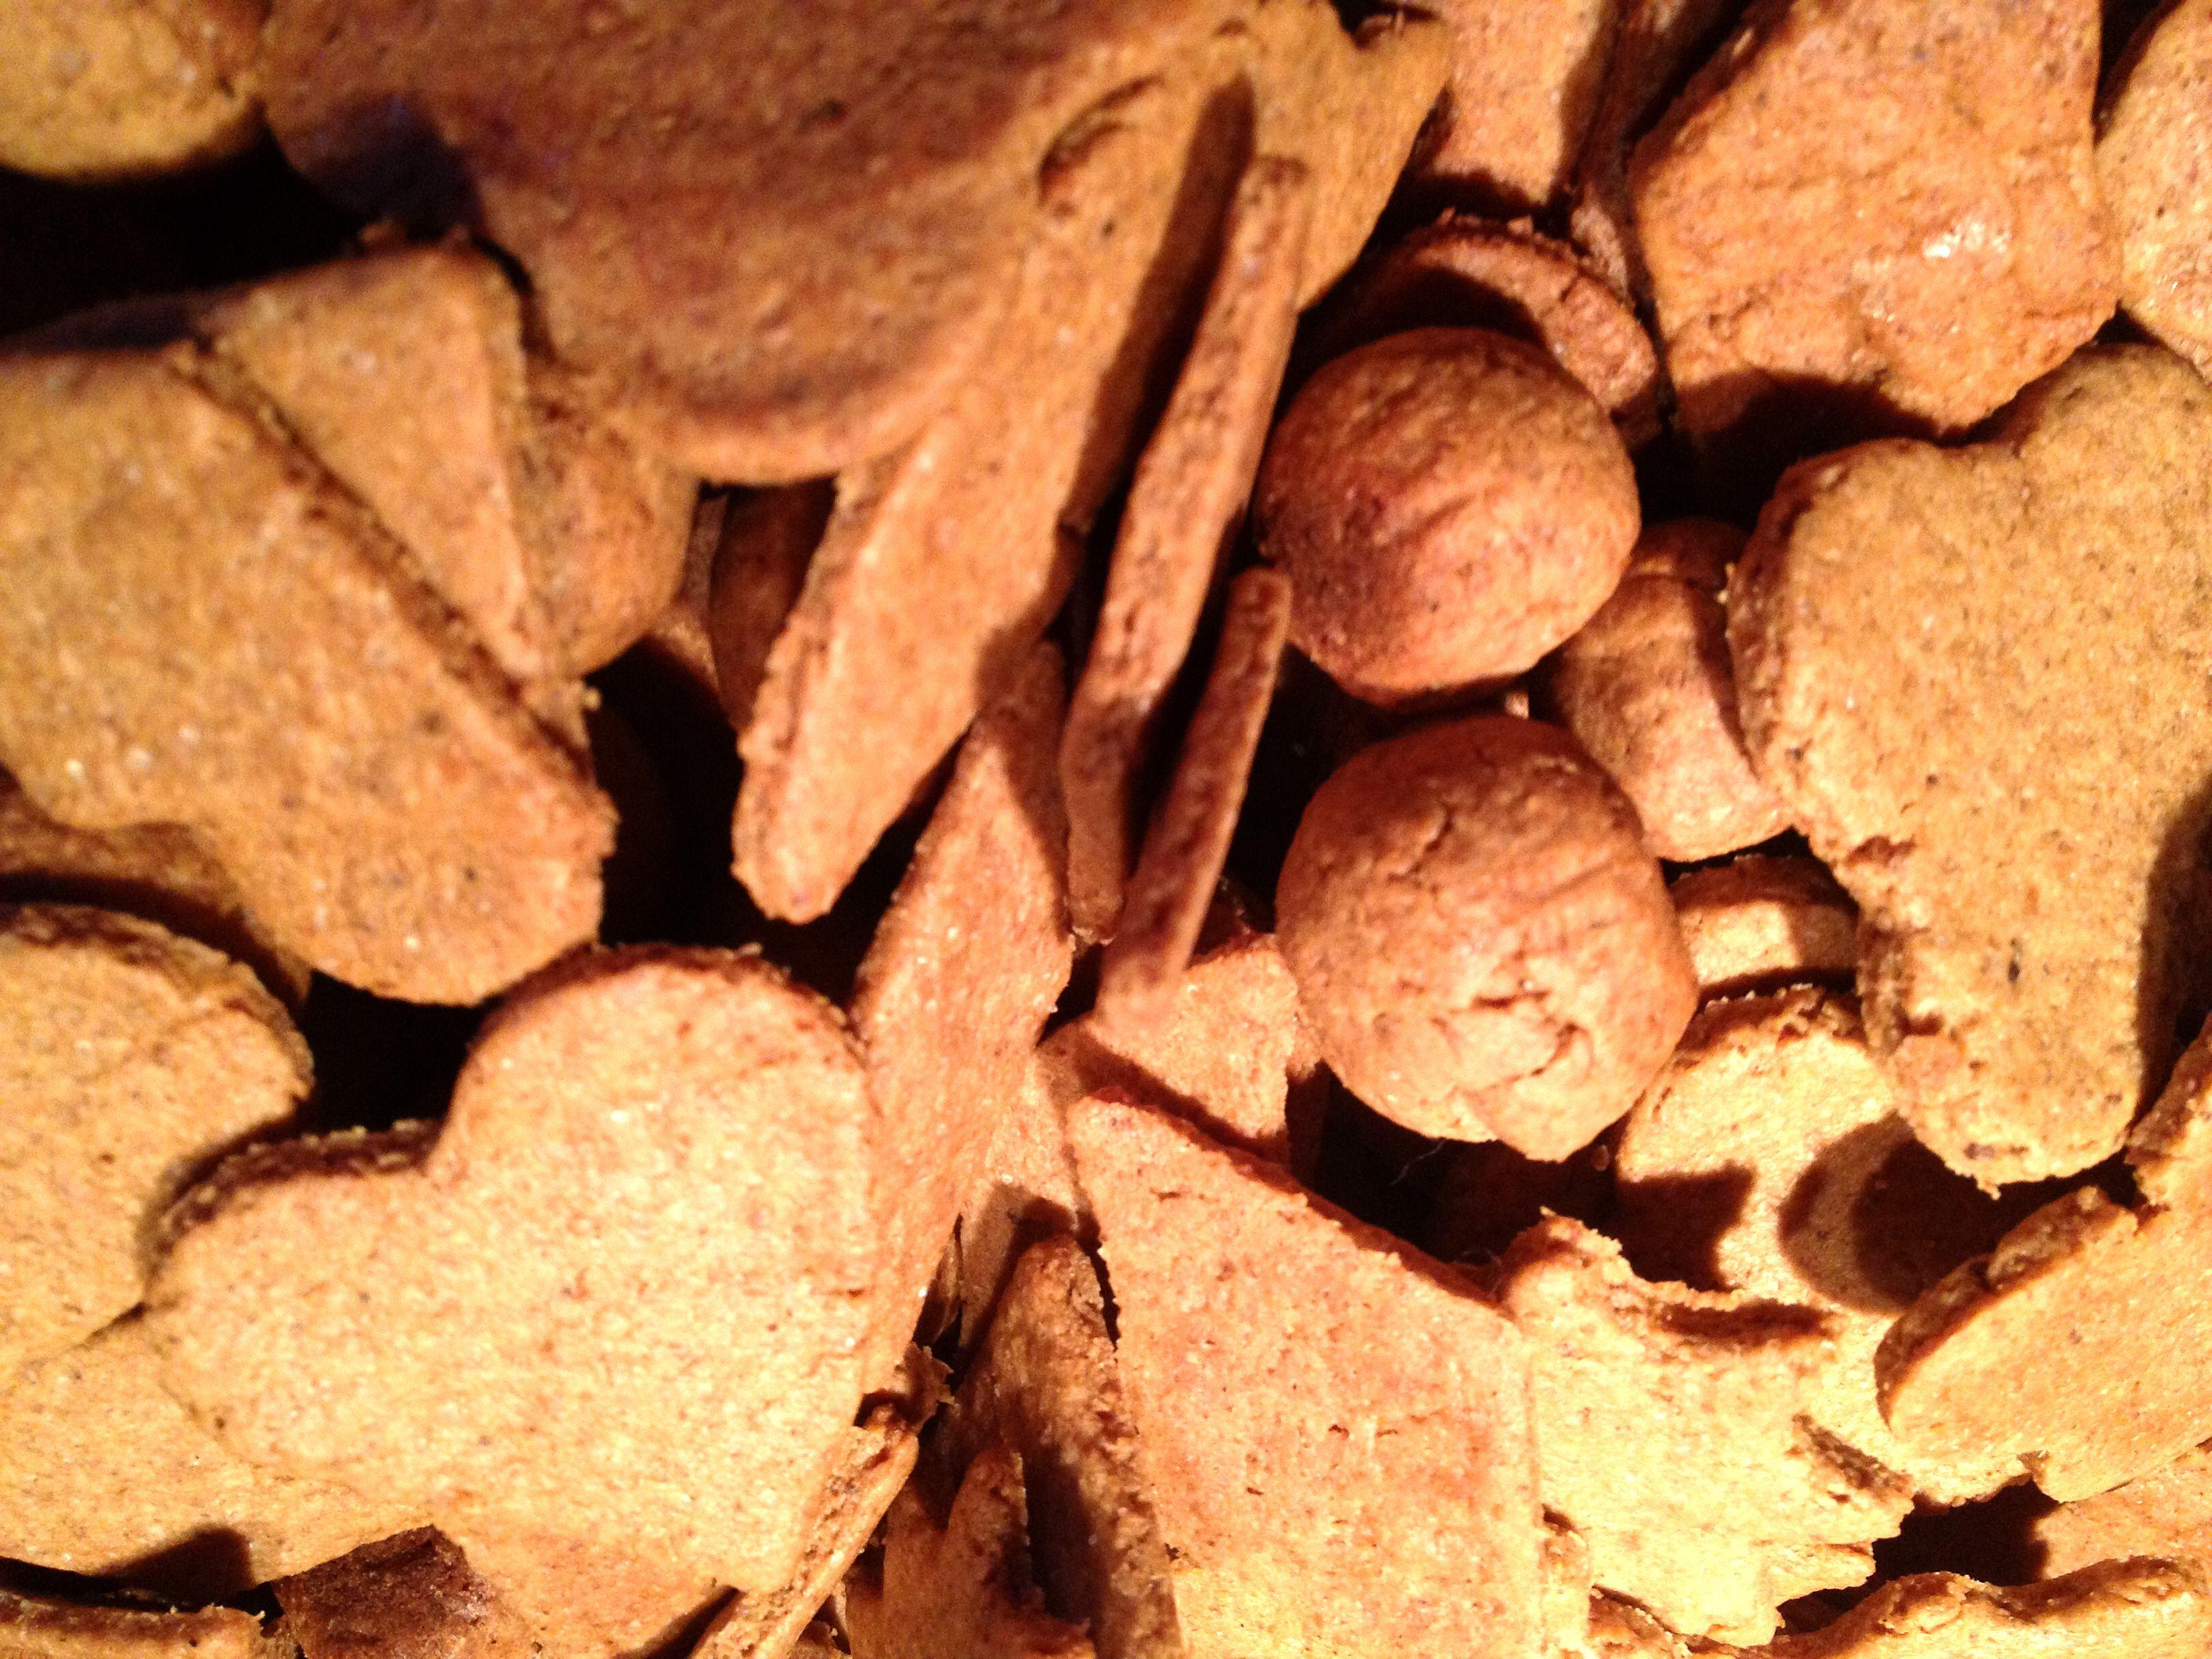 Gute laune kekse hildegard von bingen rezept